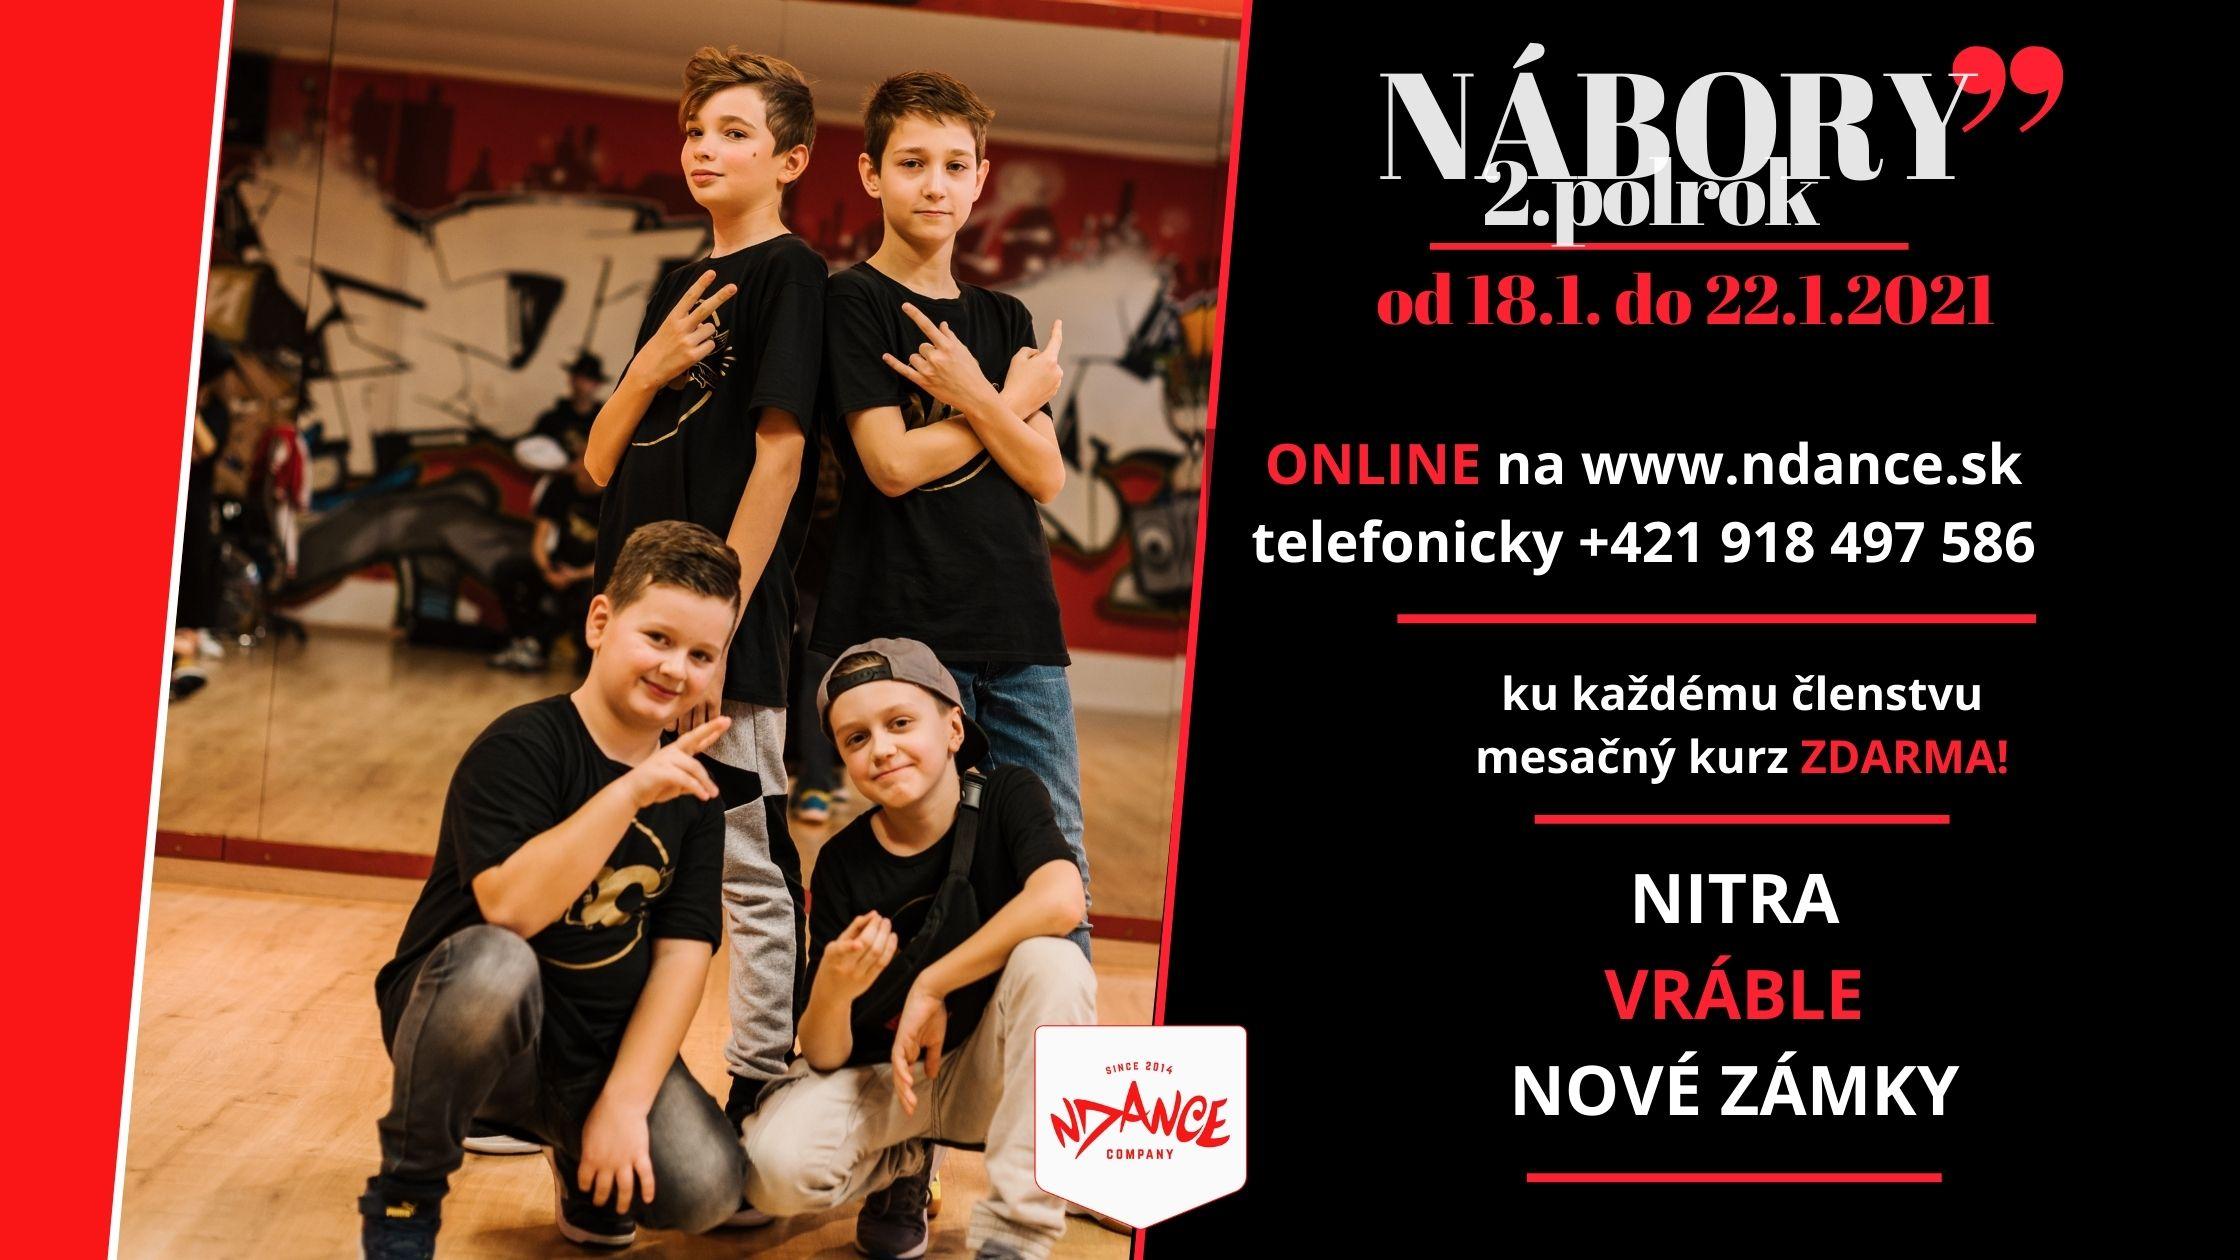 Nbory__grafika_na_web_banner